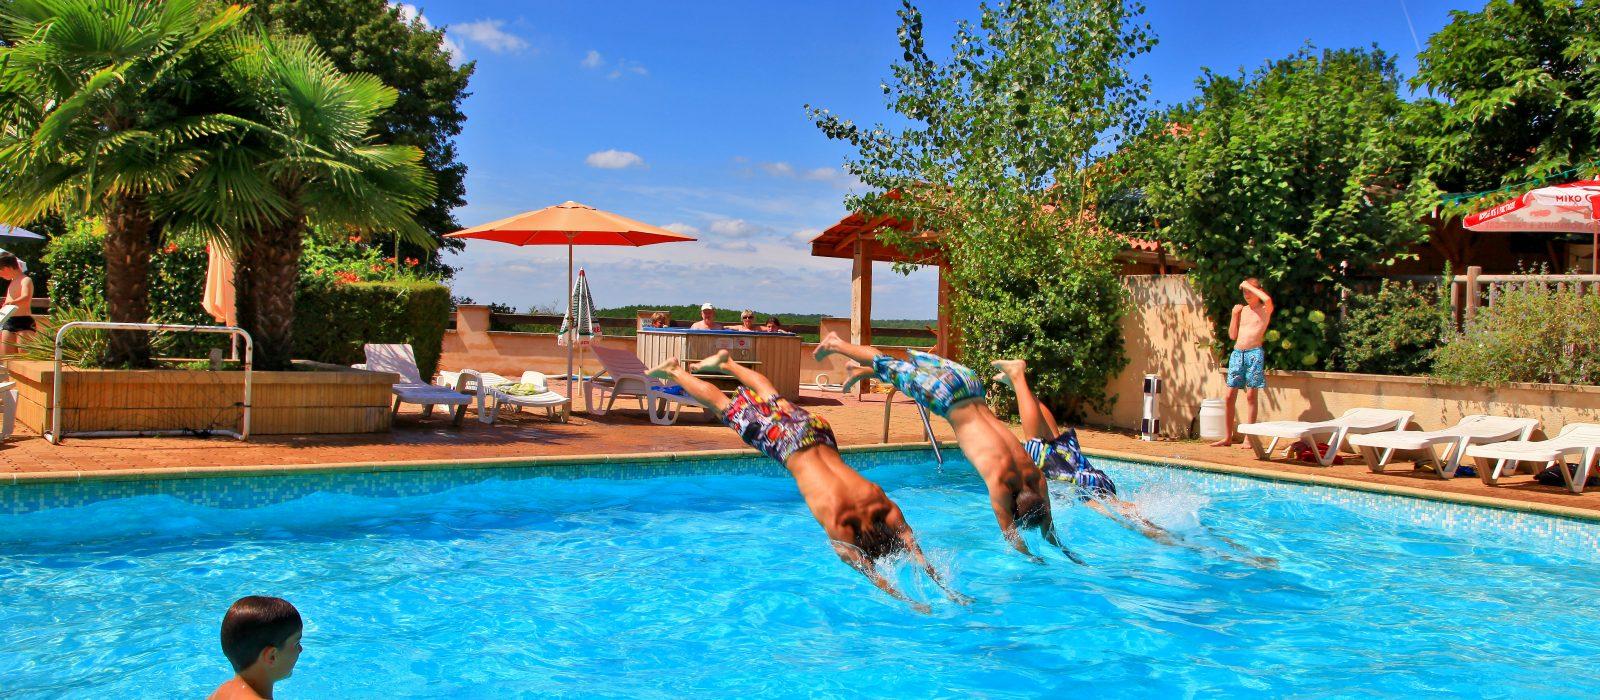 piscine camping au p'tit Bonheur Dordogne